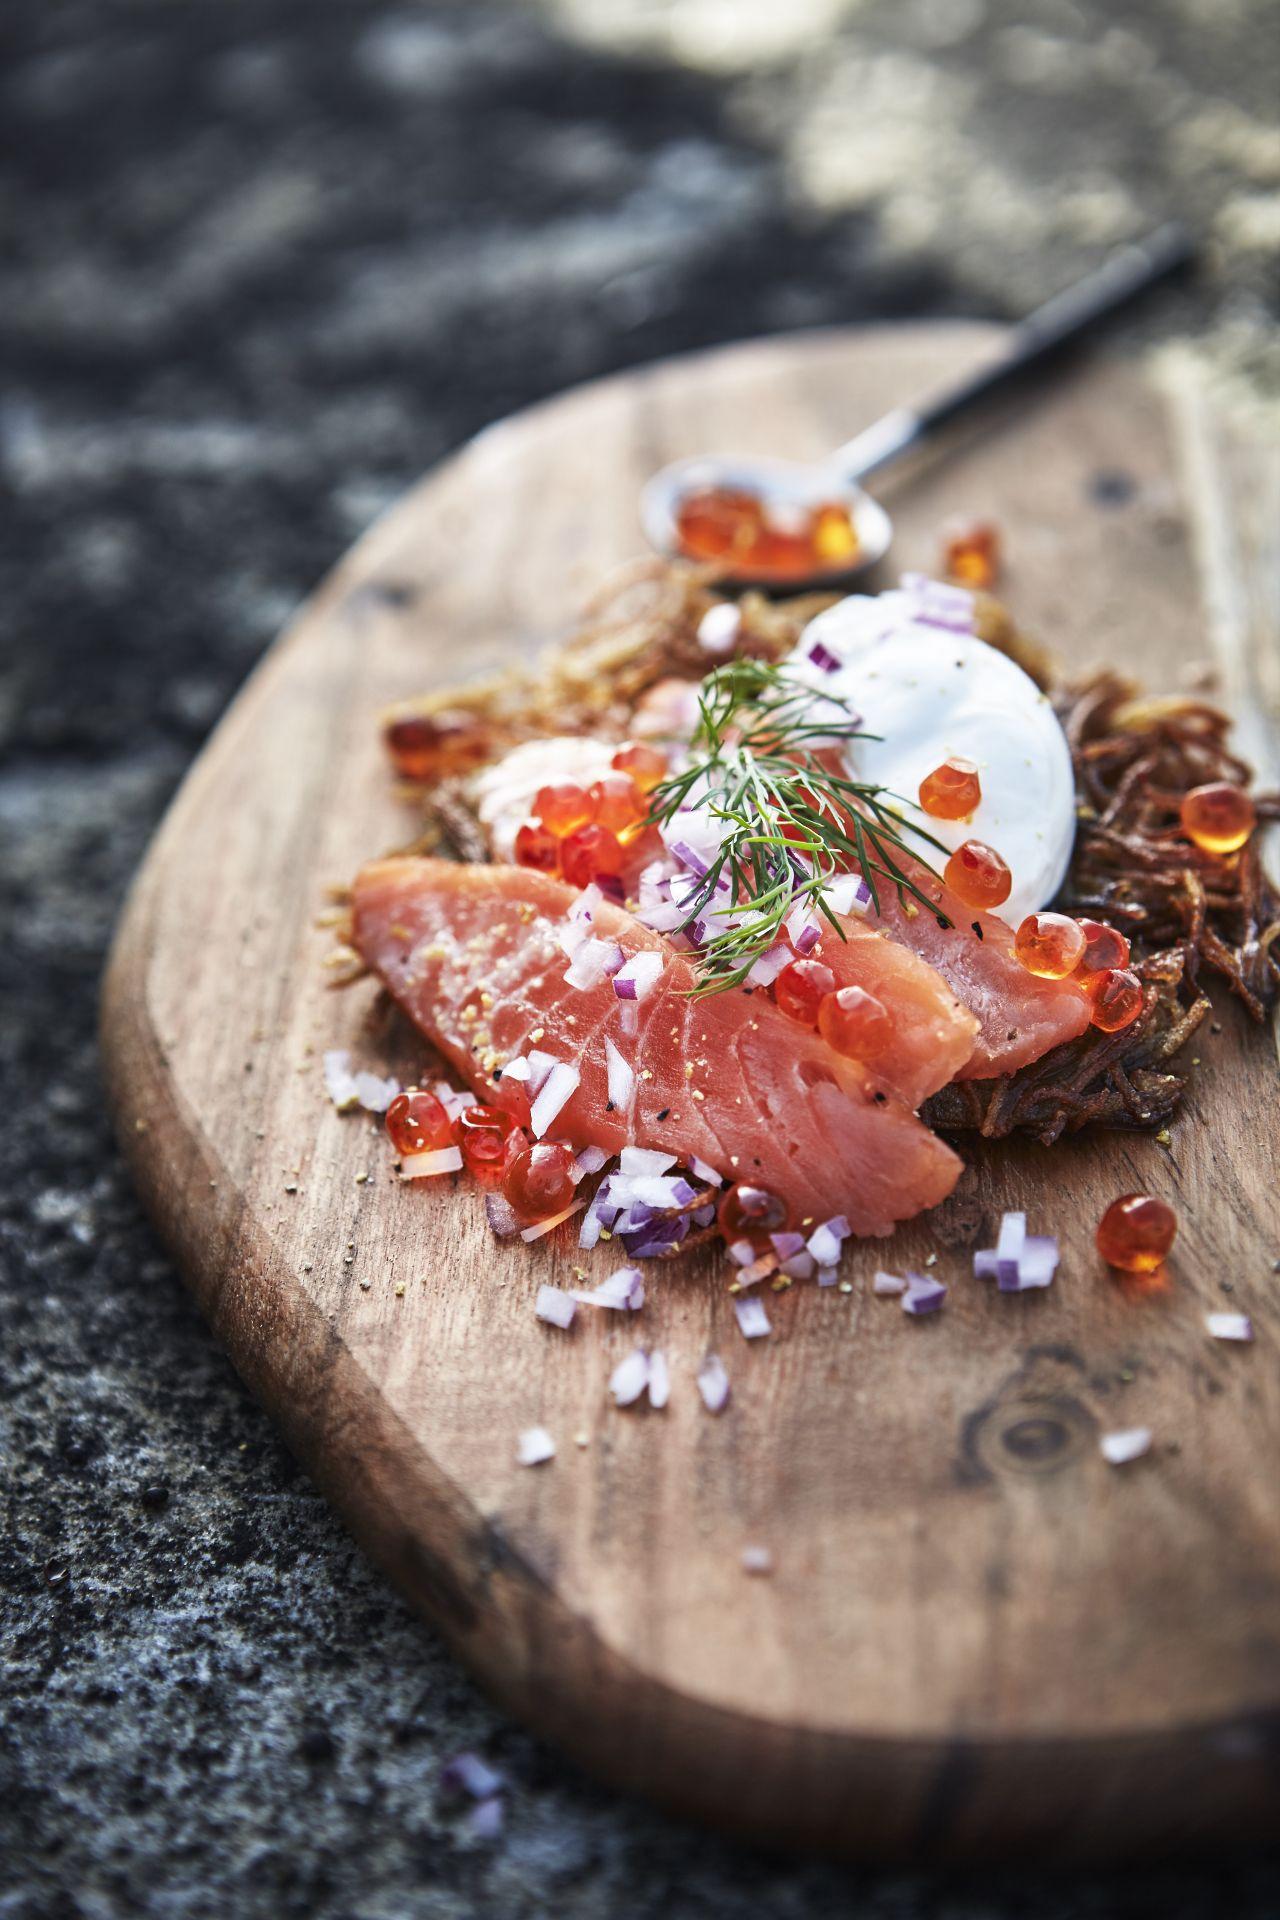 Sjorapport Cold Smoked Salmon Asc Certified Frozen Ikea Switzerland Smoked Salmon Food Baked Salmon Recipes